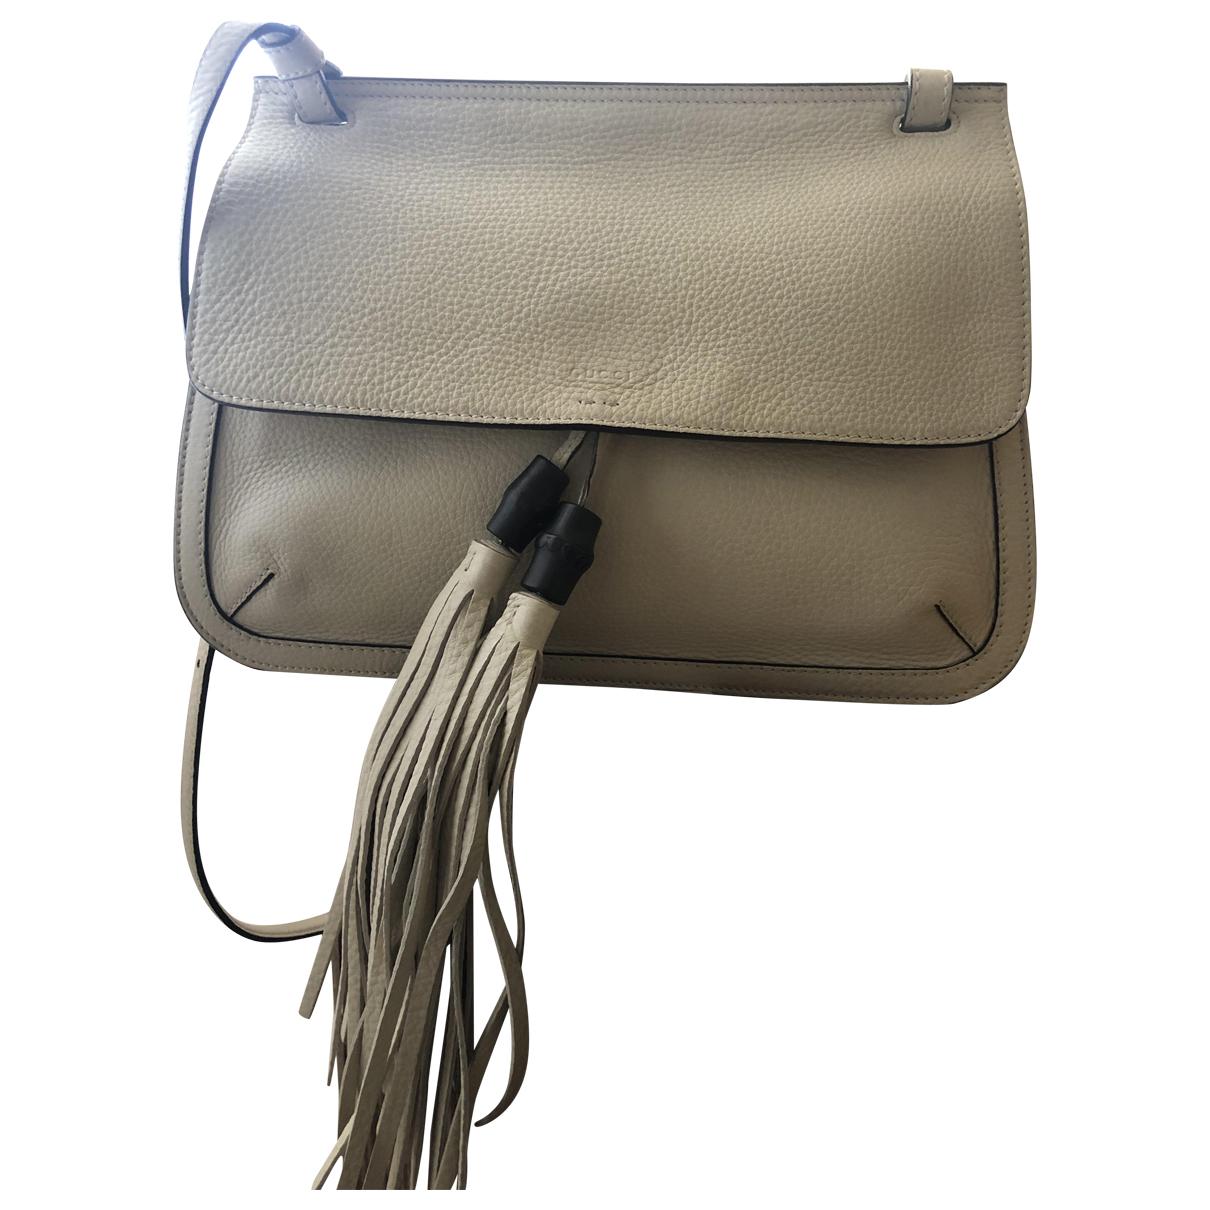 Gucci Bamboo Beige Leather handbag for Women \N